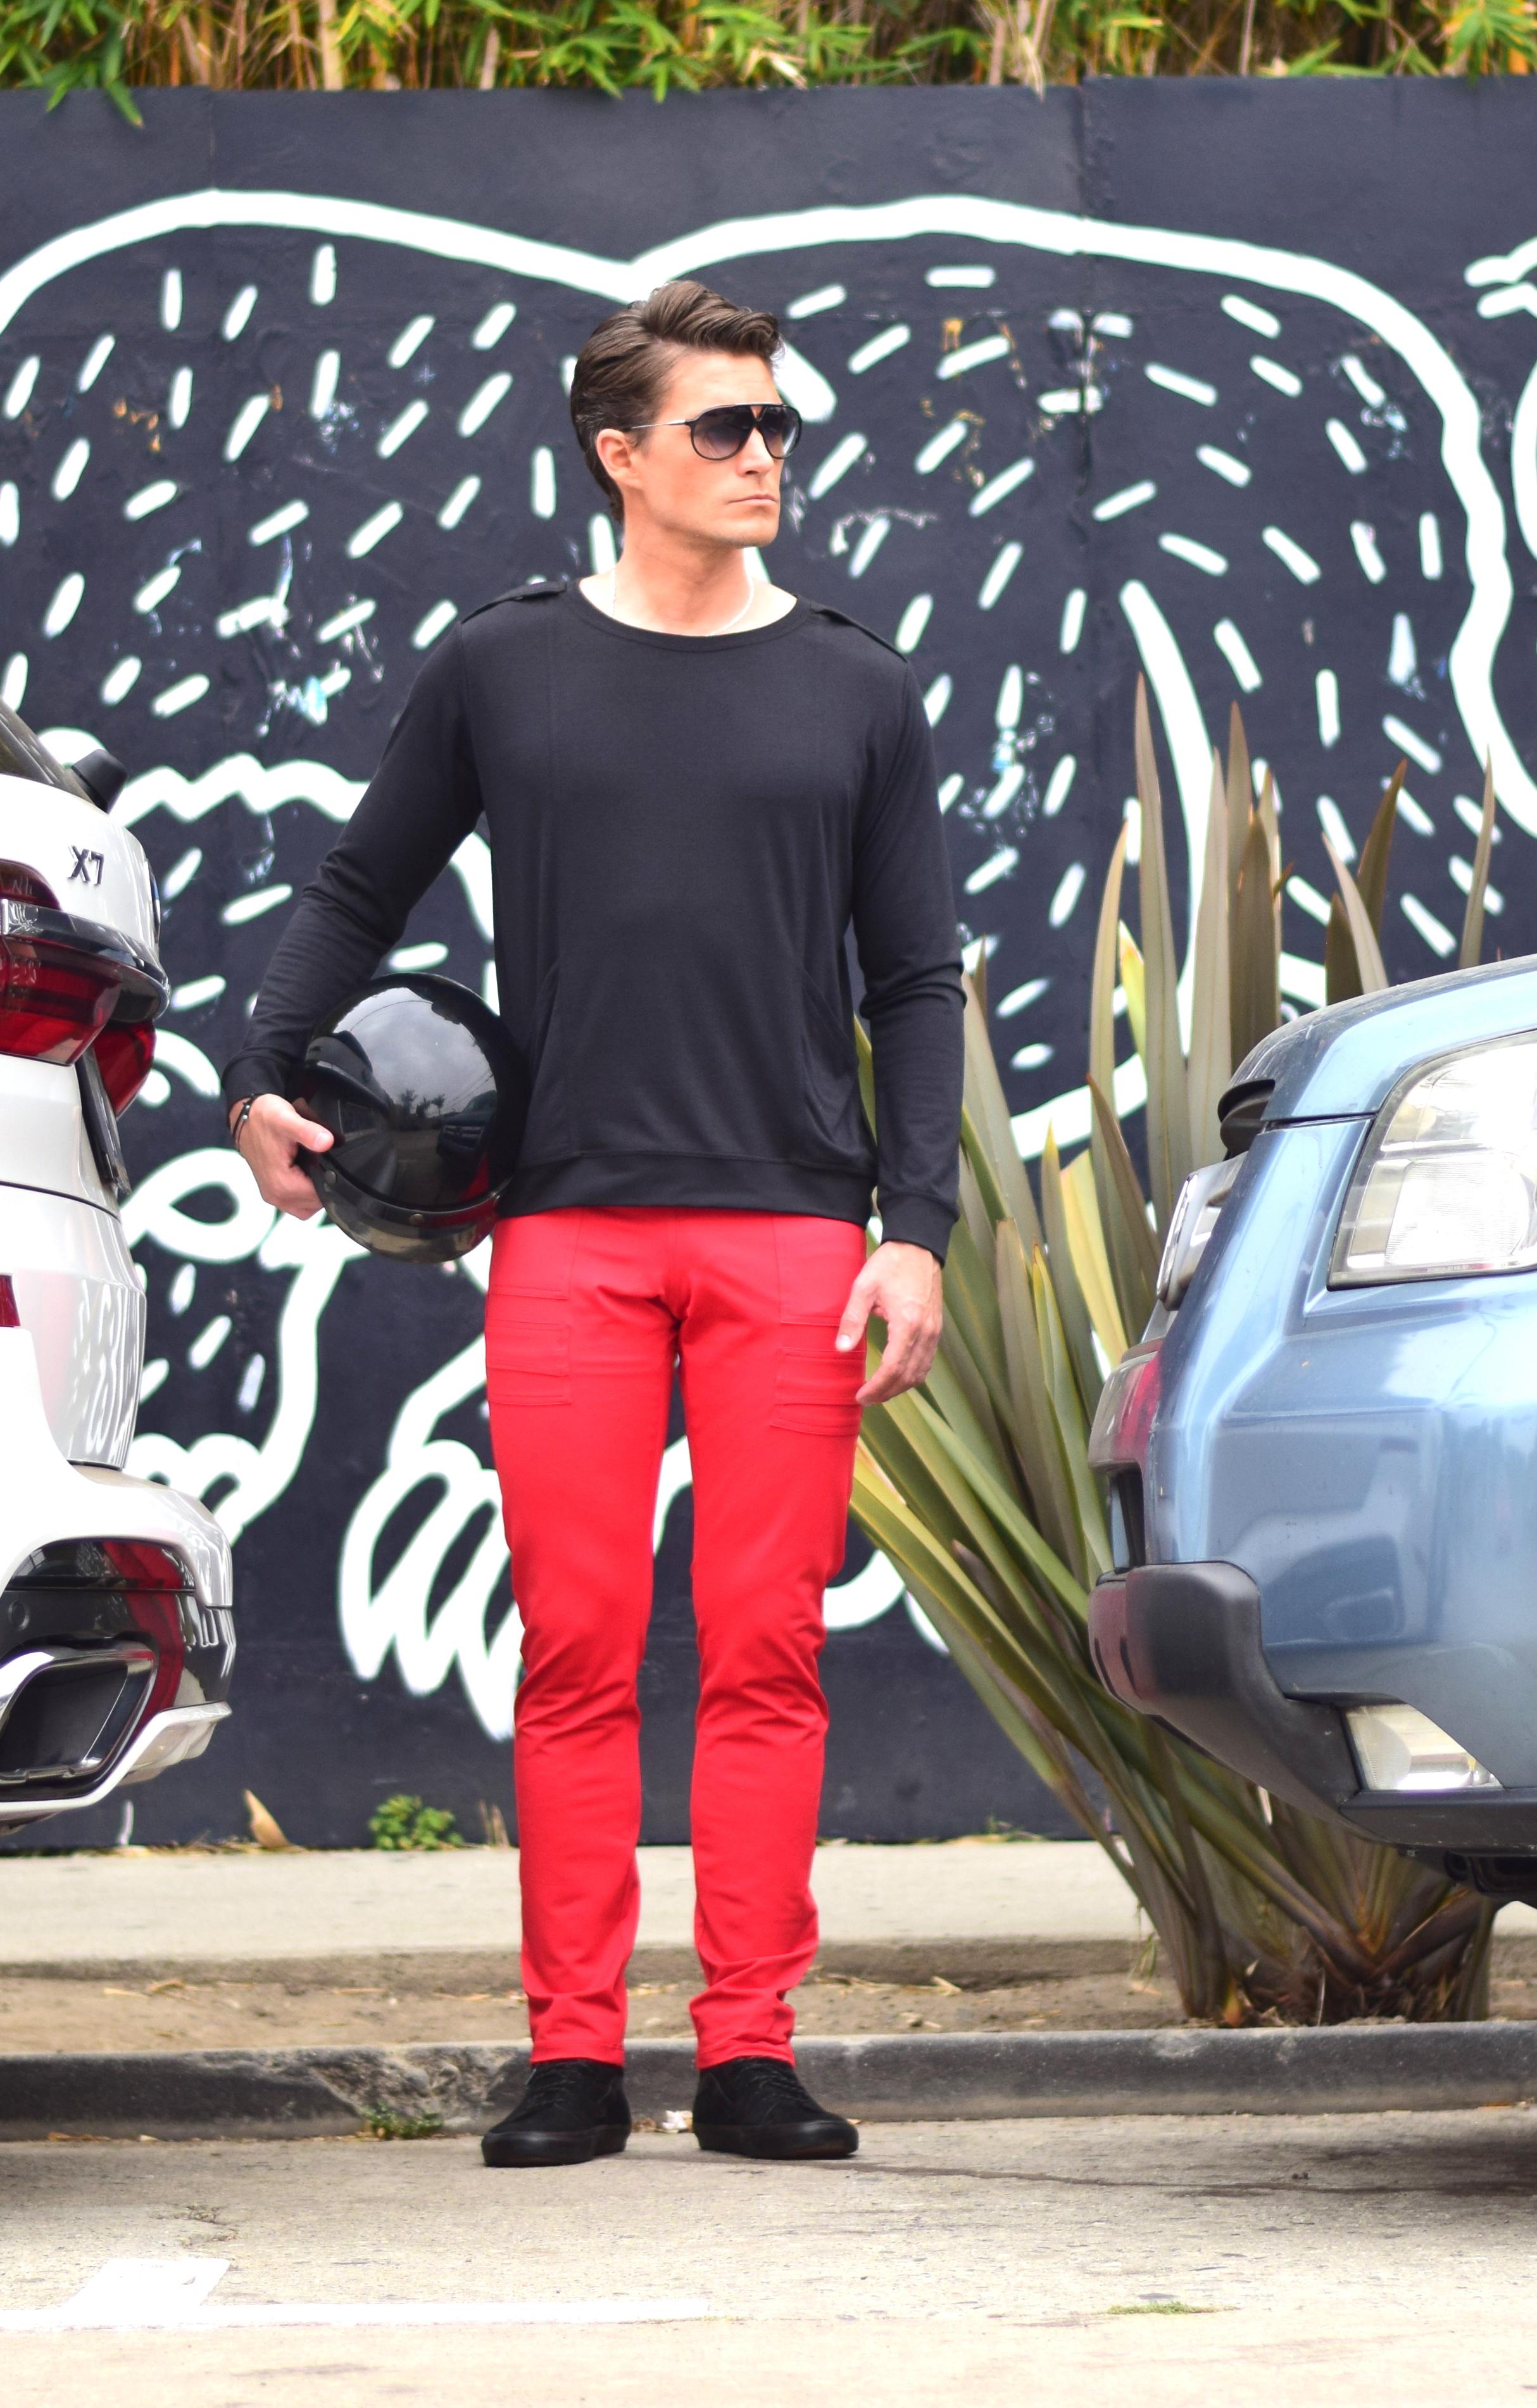 ULA TRACK PANT RED